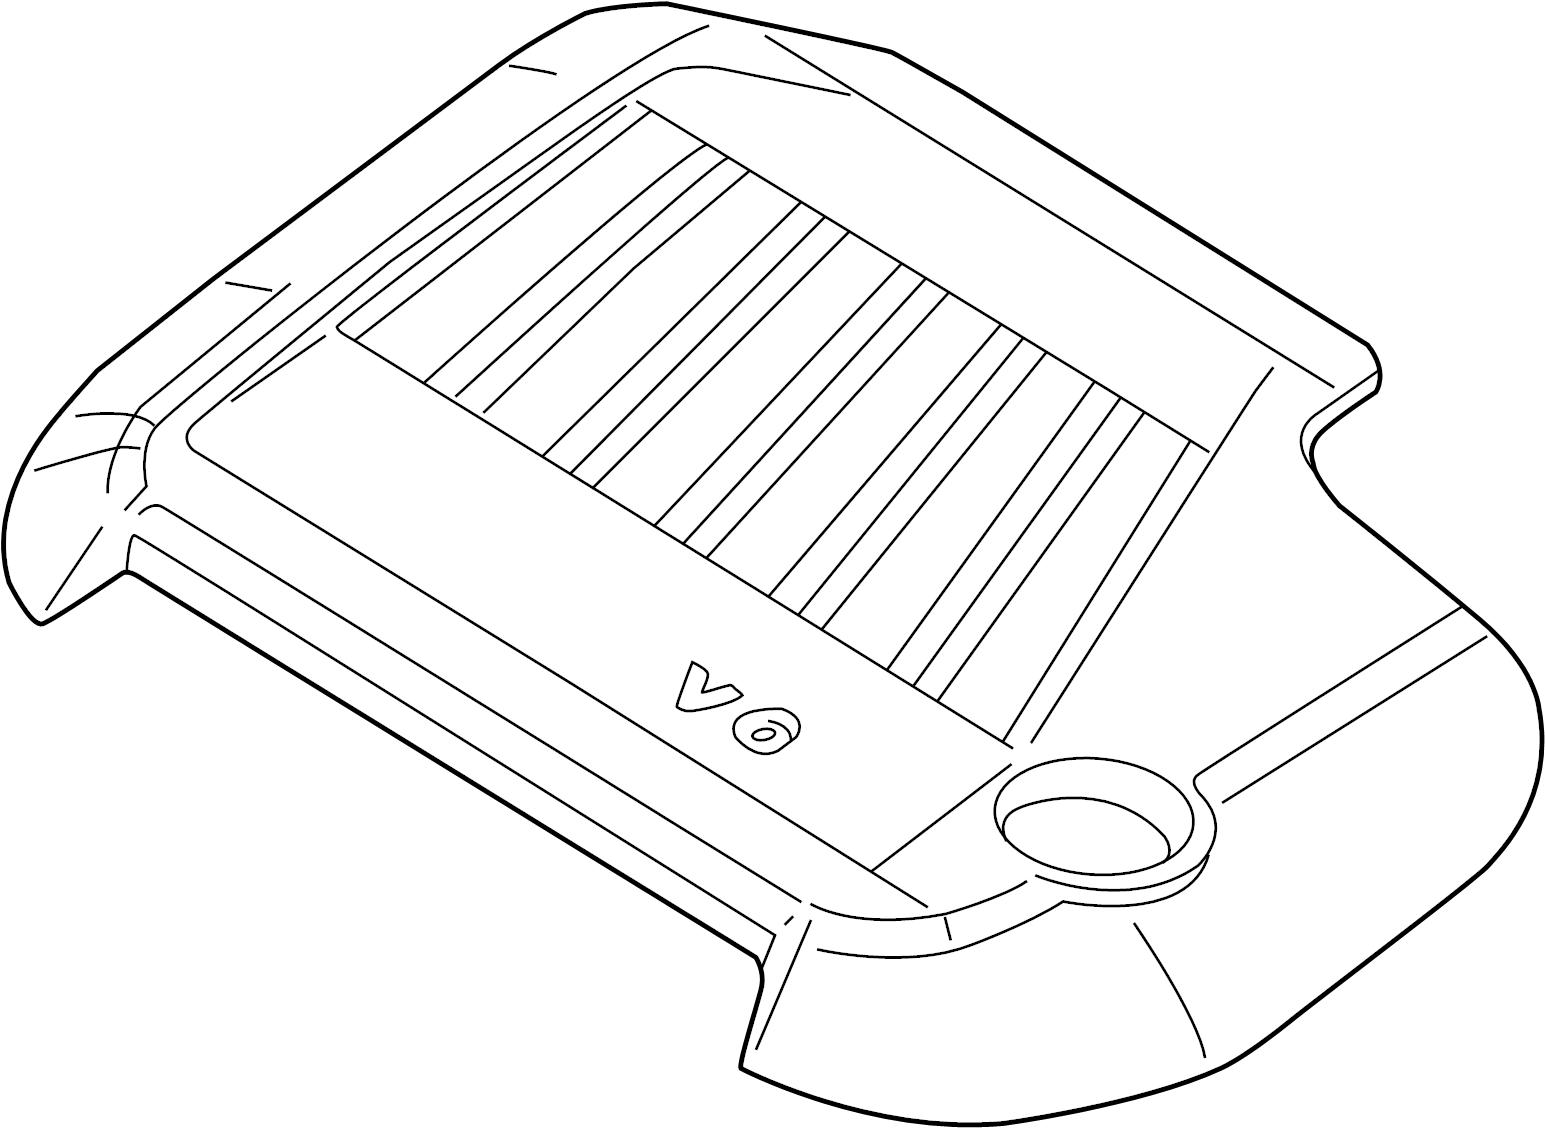 2002 Vw Jetta 2 0 Engine Diagram / 2002 Vw Passat Cooling